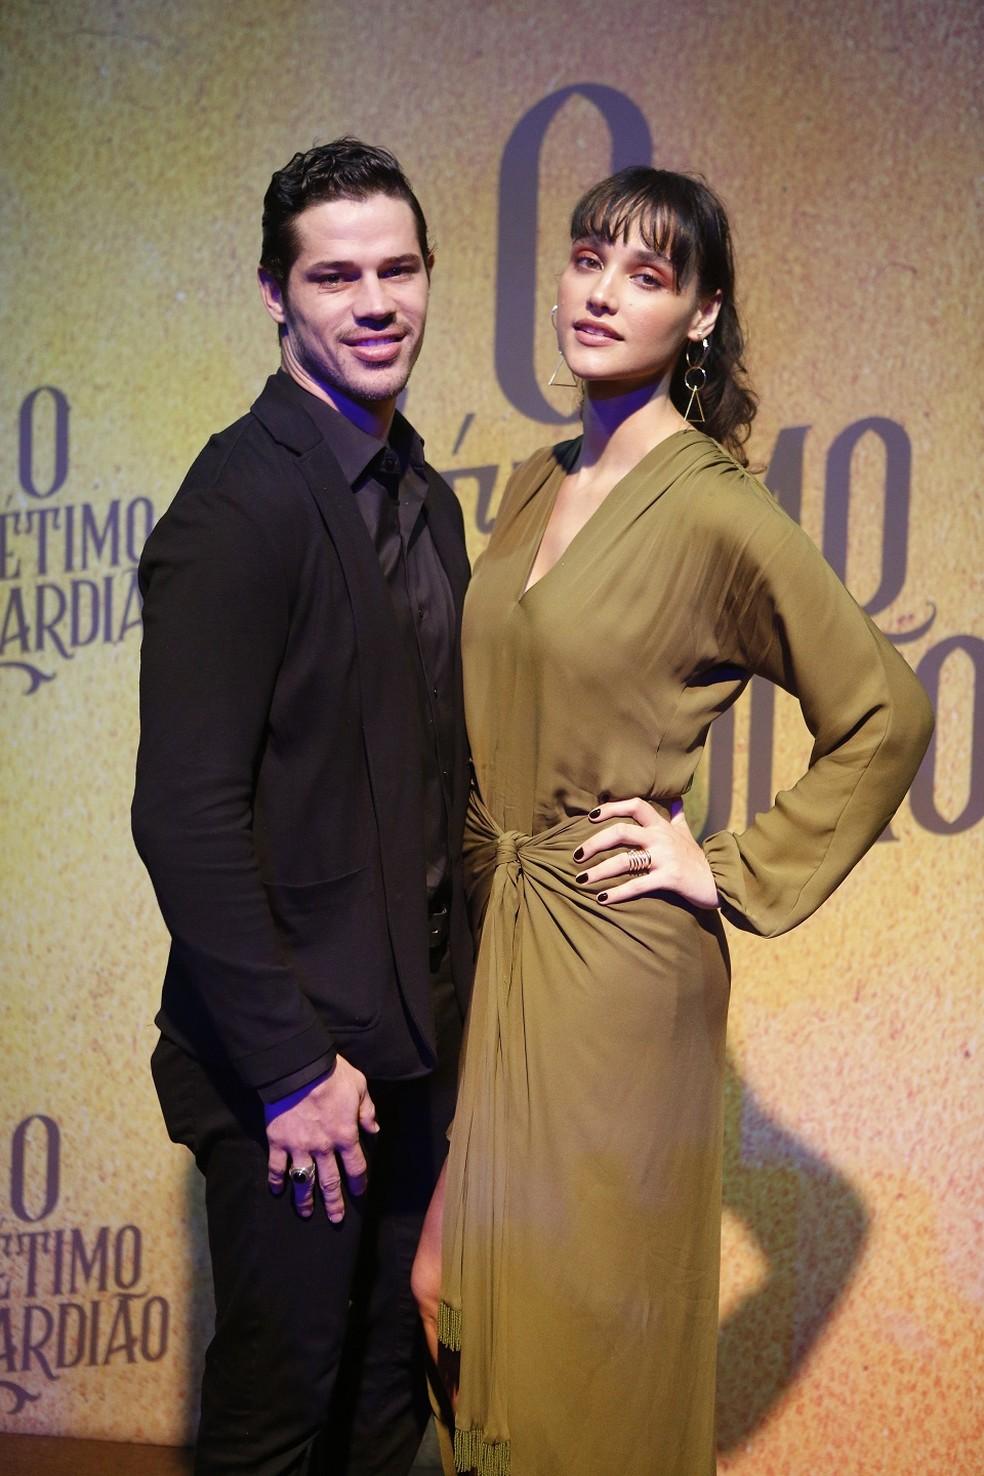 José Loreto e Débora Nascimento brilham juntos! Ela interpetará o bad boy Eurico  — Foto: Fabiano Battaglin/Gshow